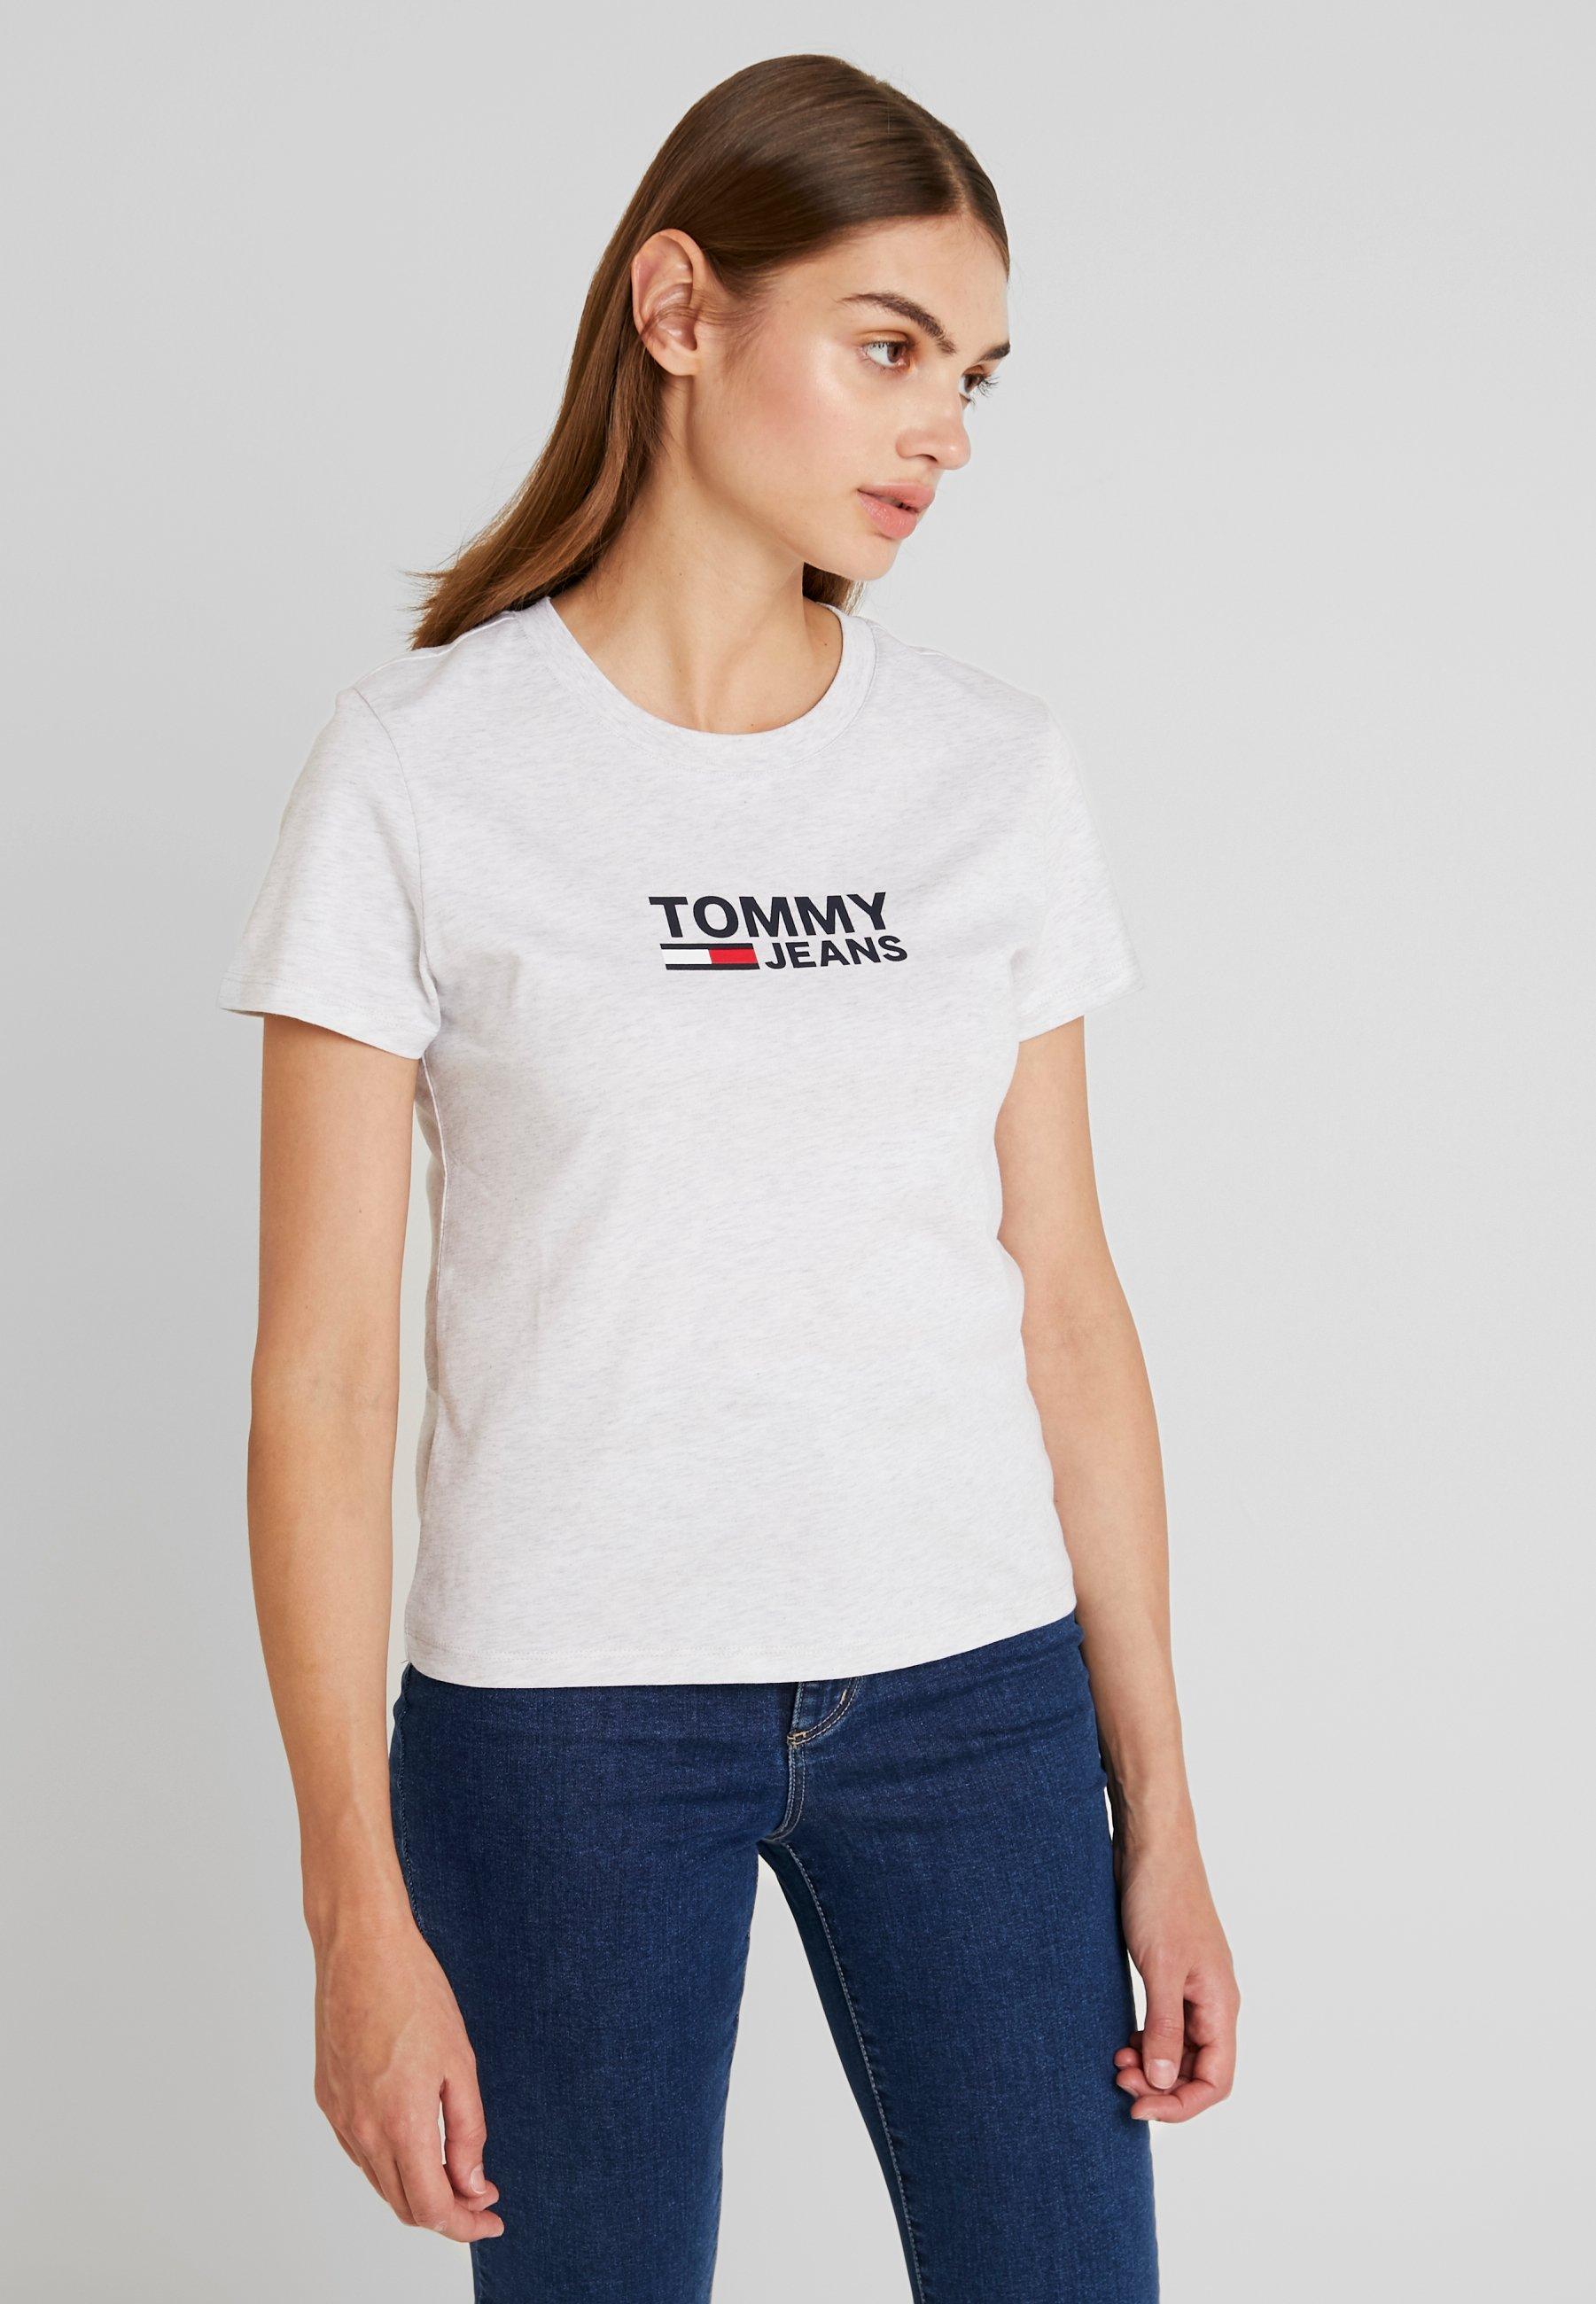 Jeans TeeT Heather Tommy Tjw Logo shirt Pale Grey Imprimé Corp 6vf7yYbg